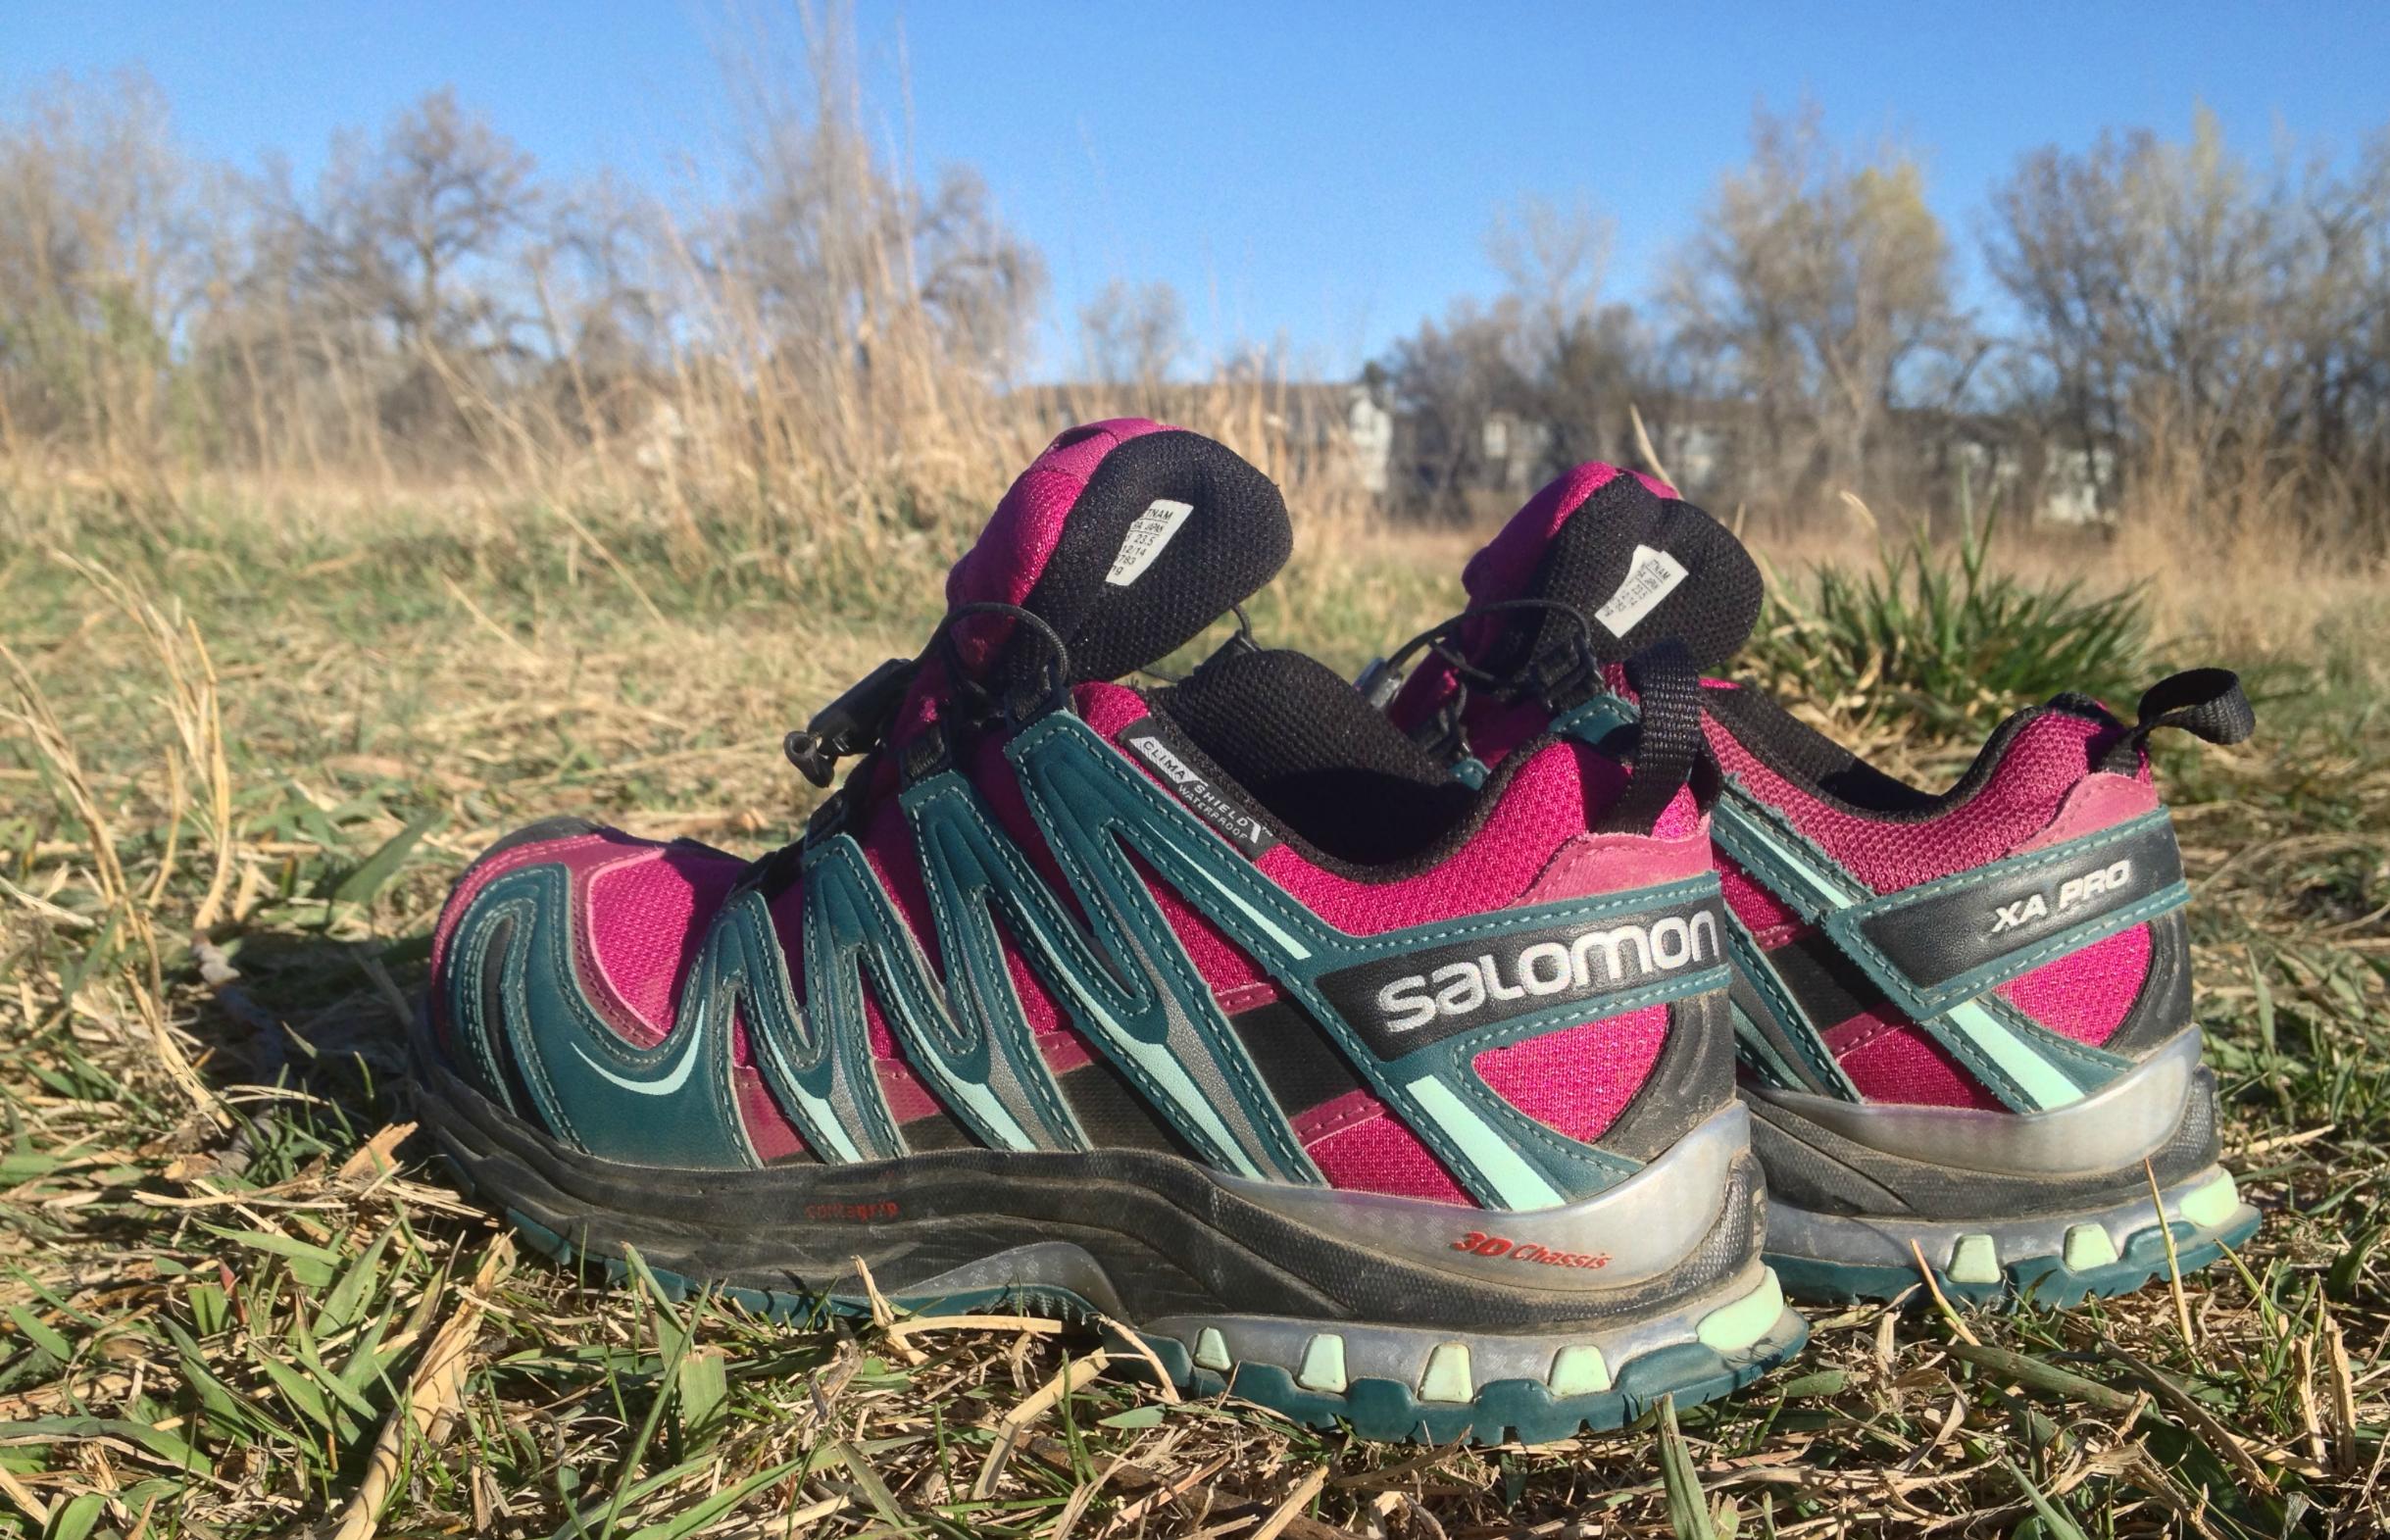 sélection premium 777a7 1c445 Gear Review: Salomon XA Pro 3D CS WP Trail Runners